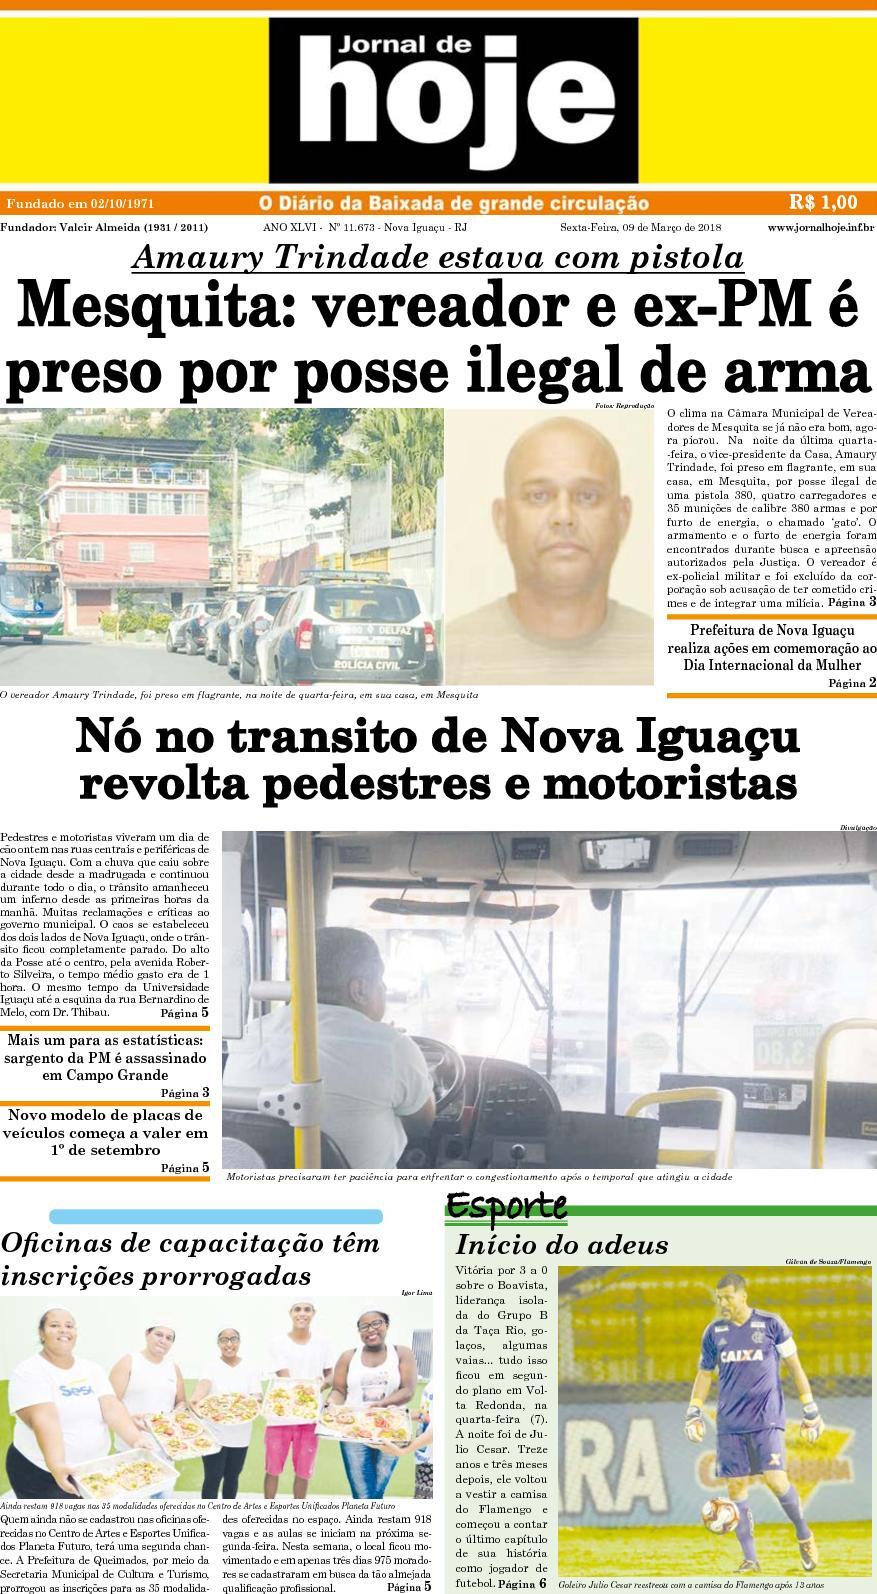 46f6c0a3c Calaméo - Jornal De Hoje 090318